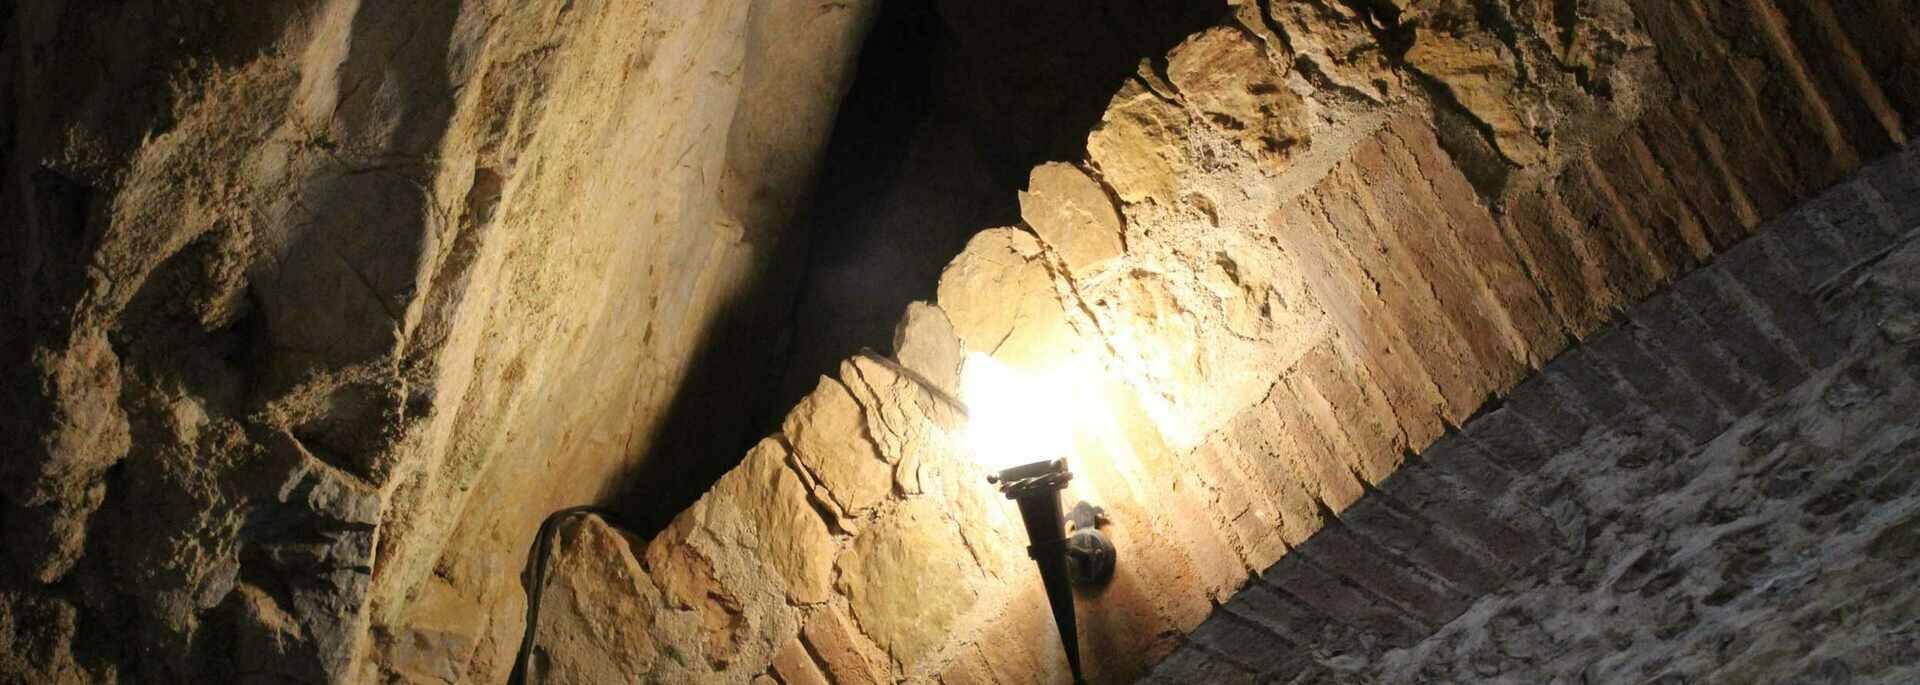 Fortification Cova Bastera, Villefranche de Conflent